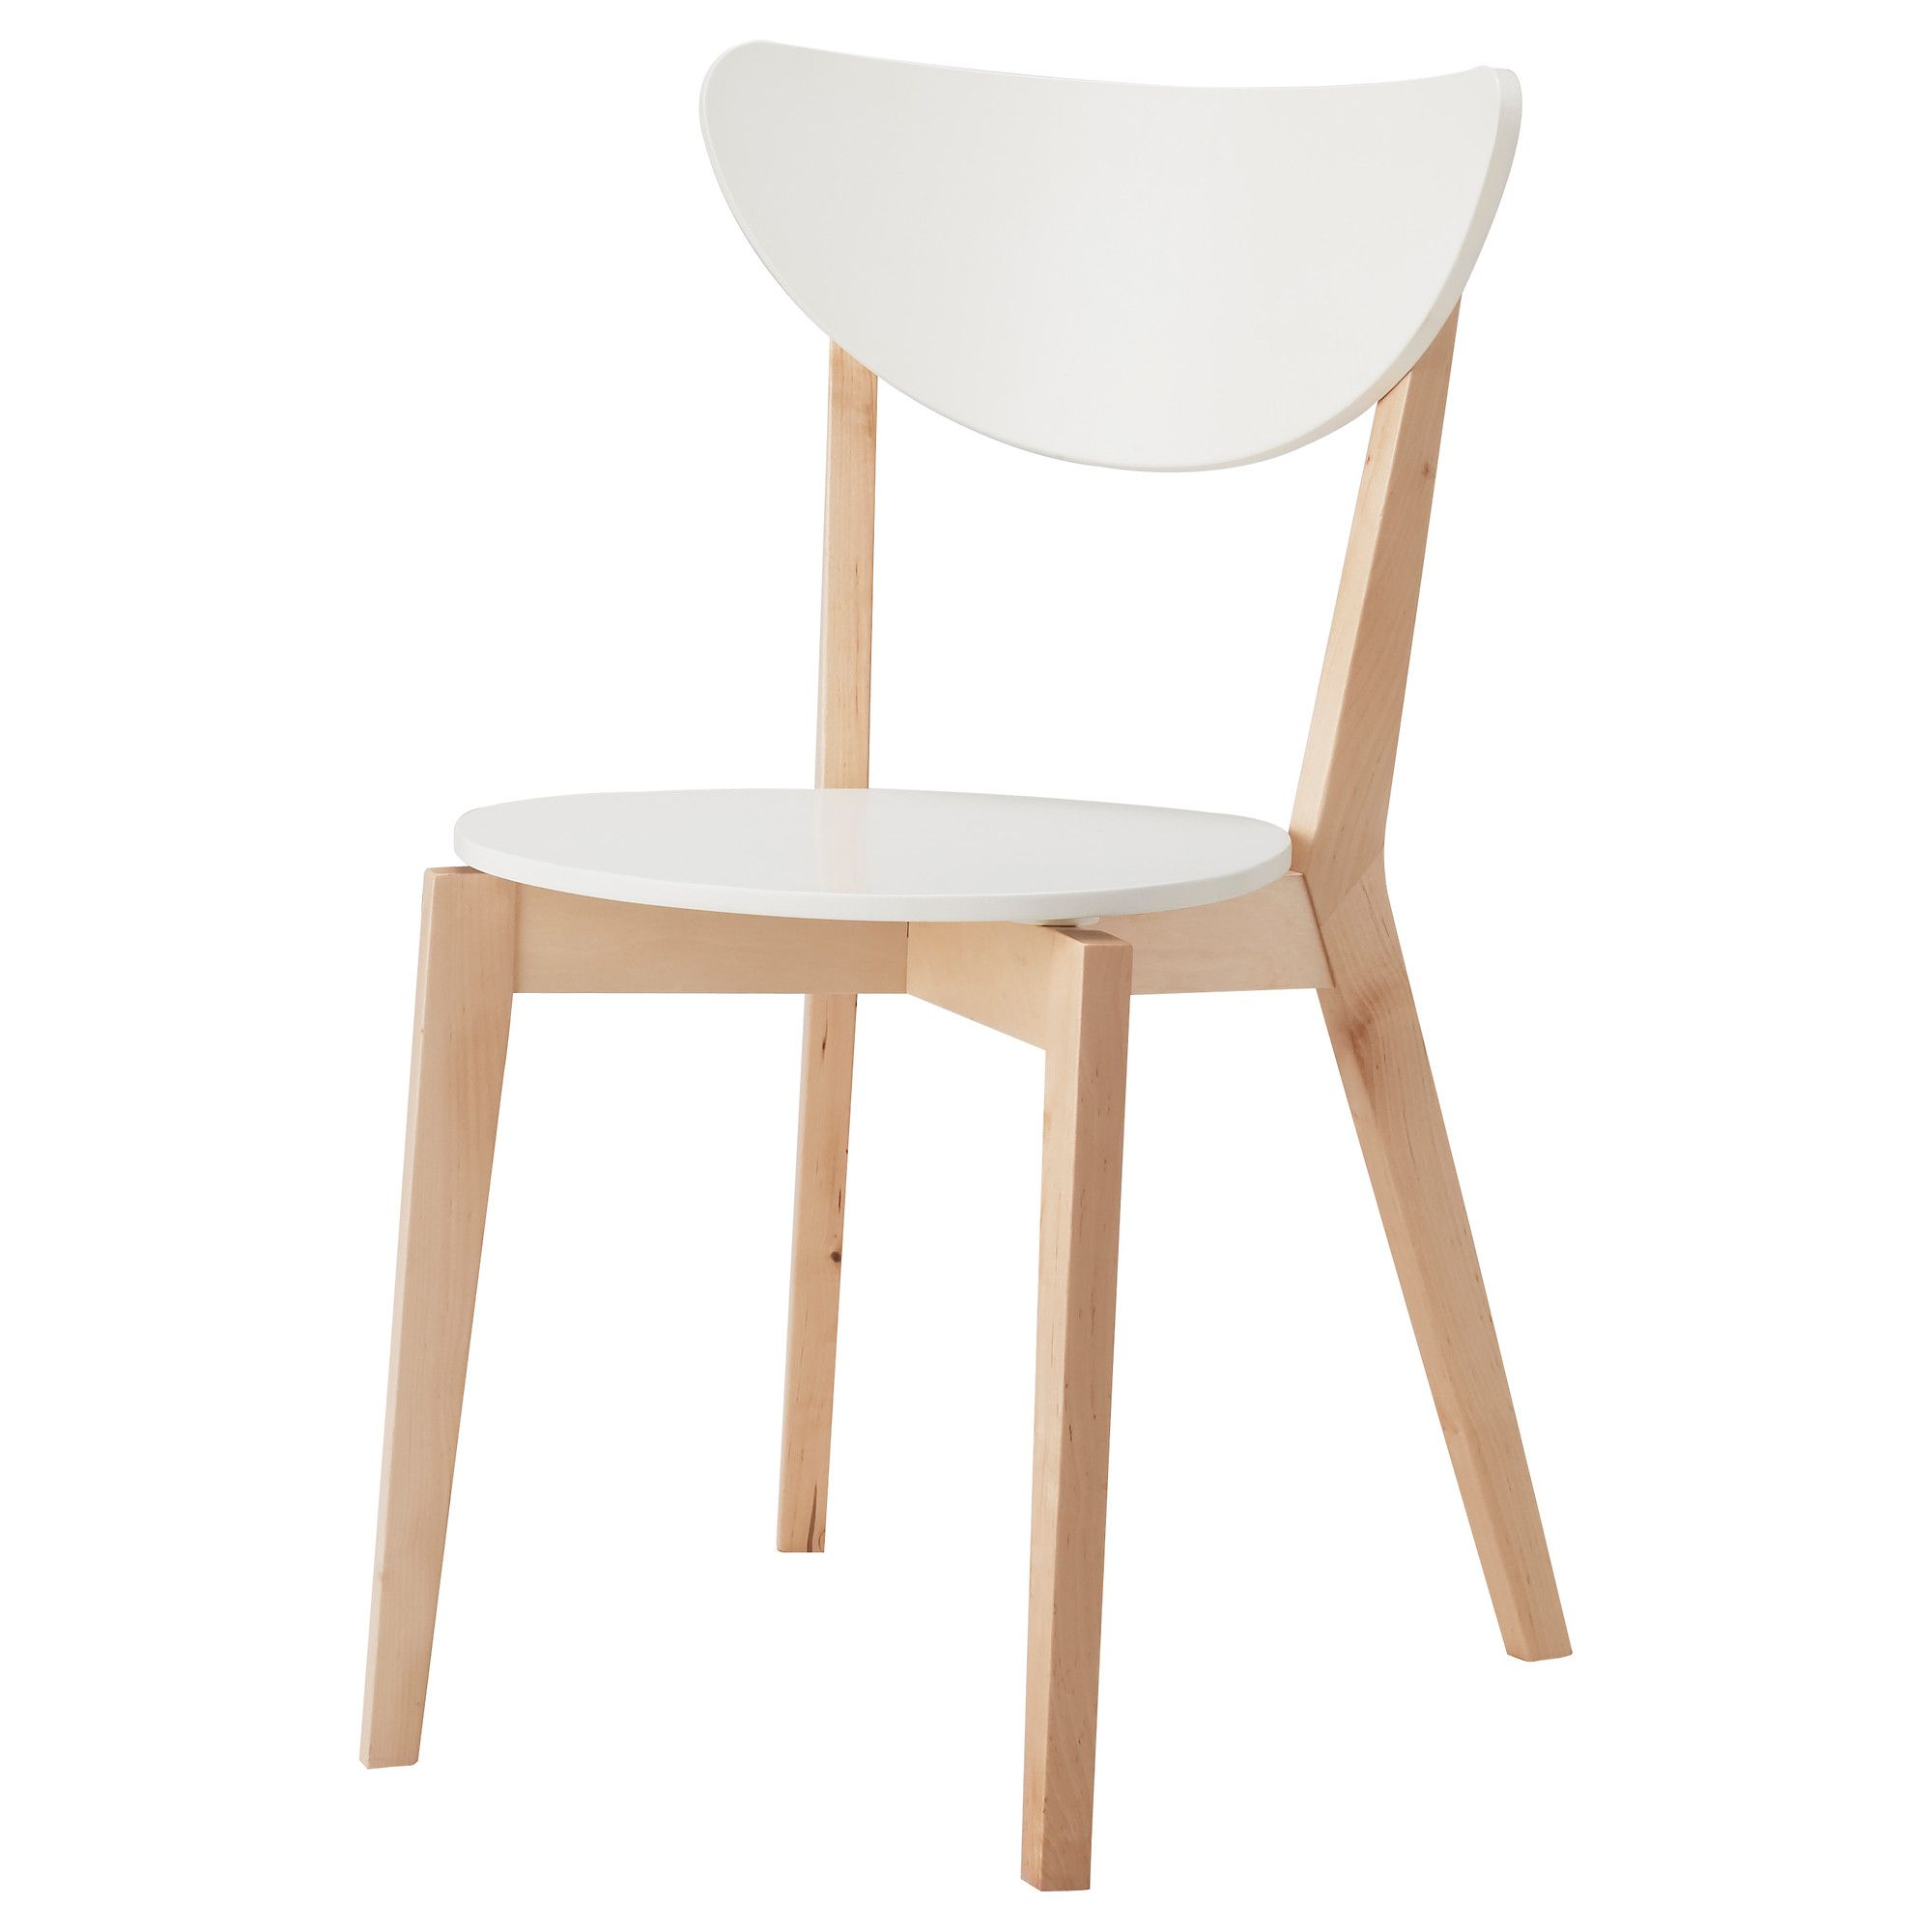 Ikea Us Furniture And Home Furnishings Ikea Chair Ikea Dining Chair Dining Chairs